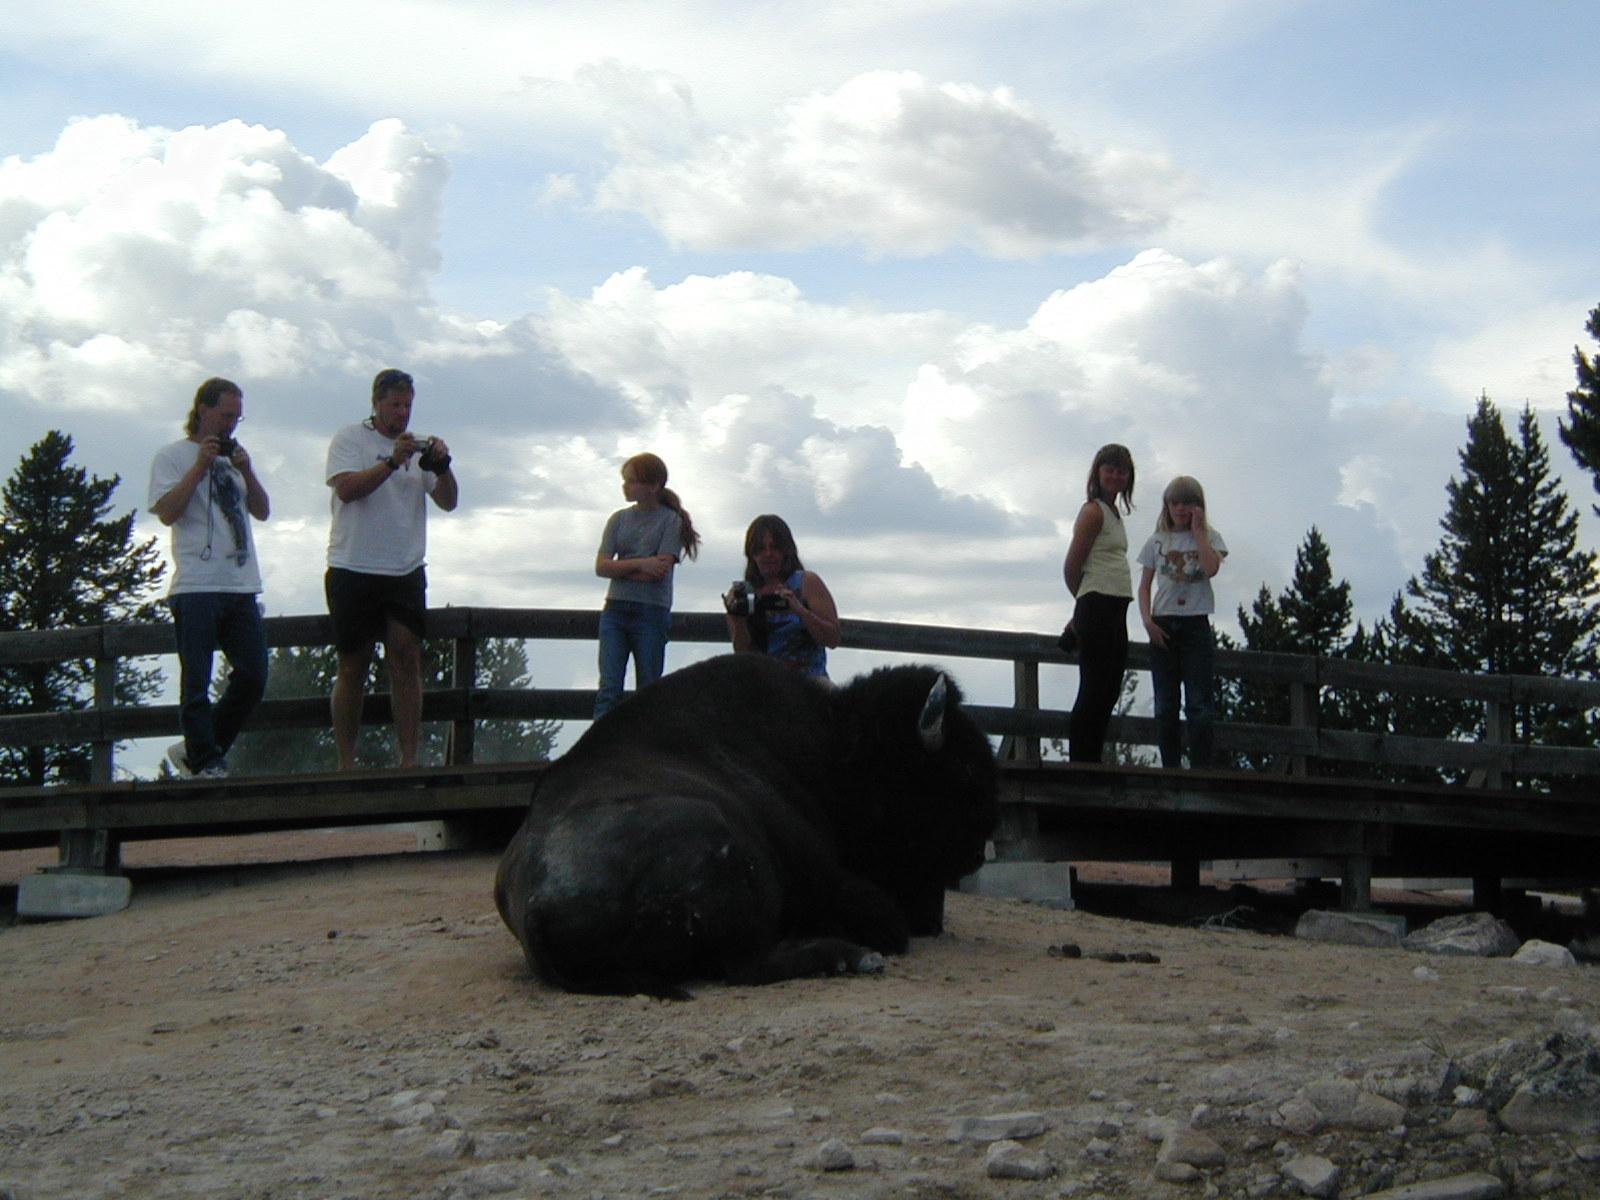 Bison by the Boardwalk